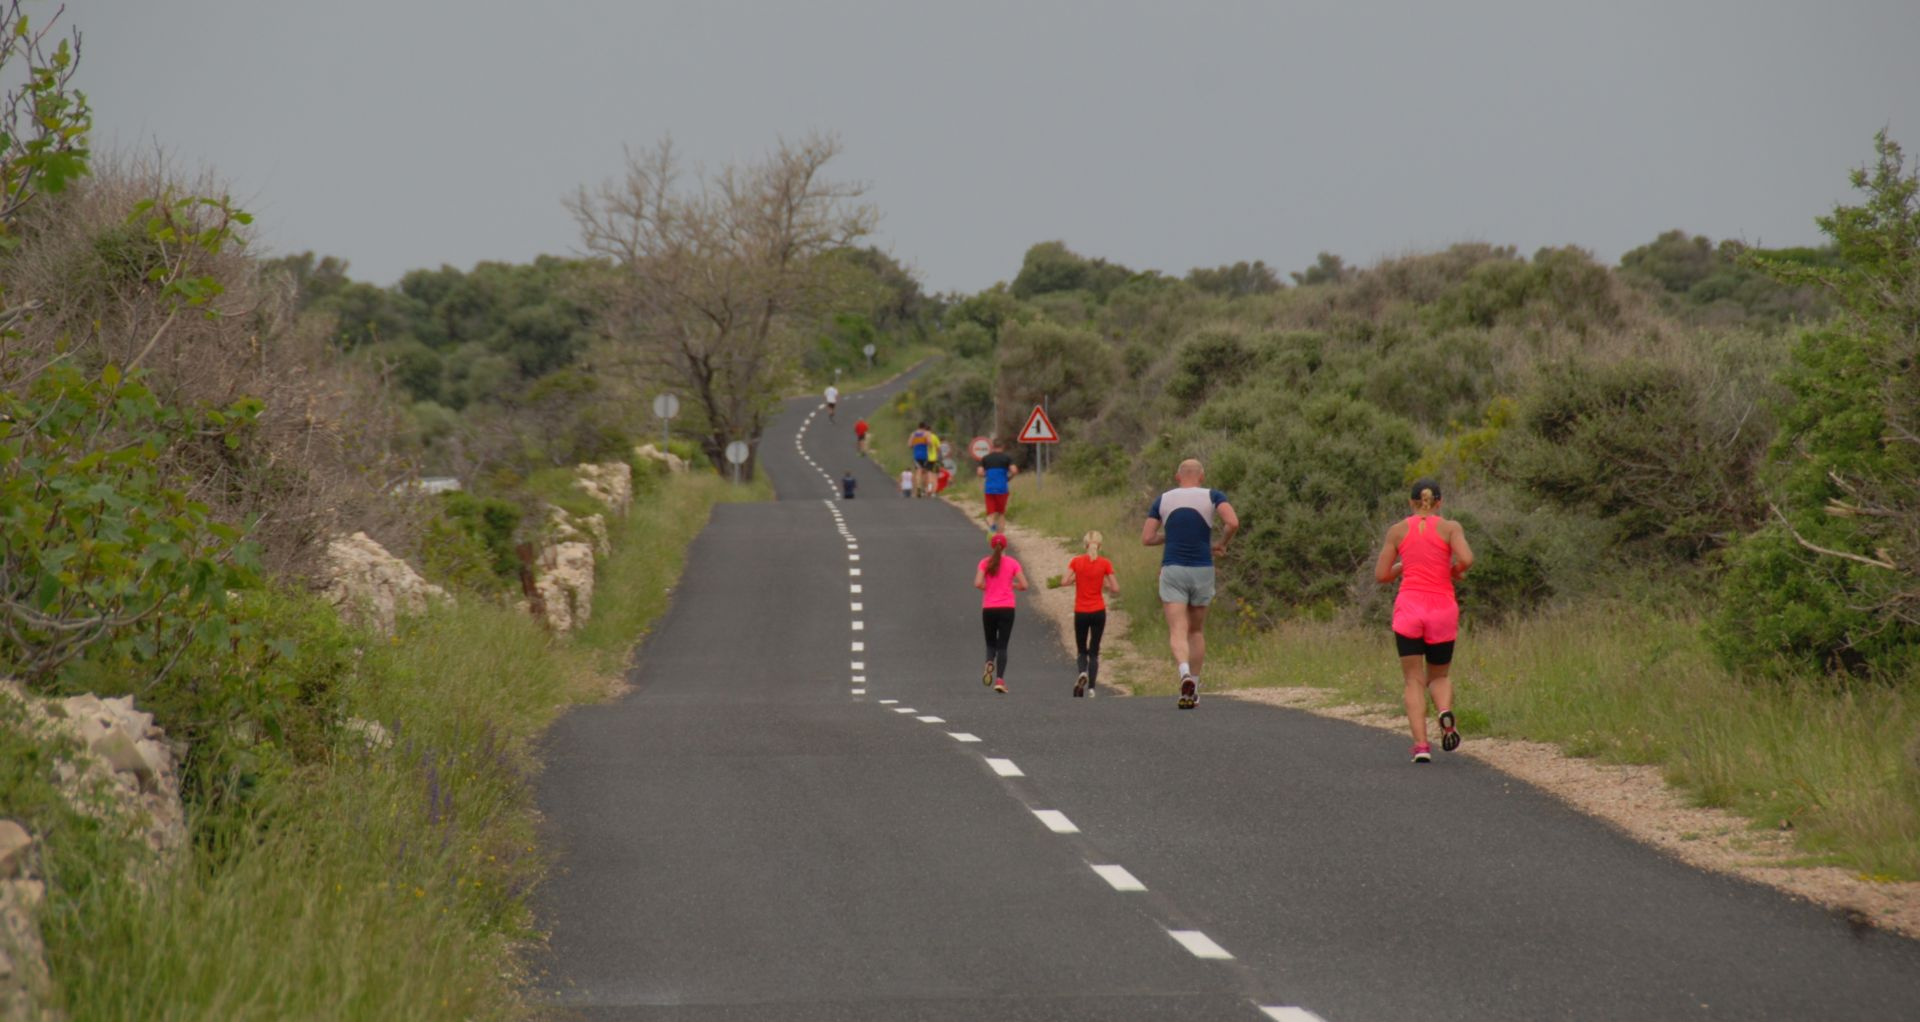 Trkači iz čak 14 zemalja trčali su 'Run Croatia' polumaraton Novalja – Lun